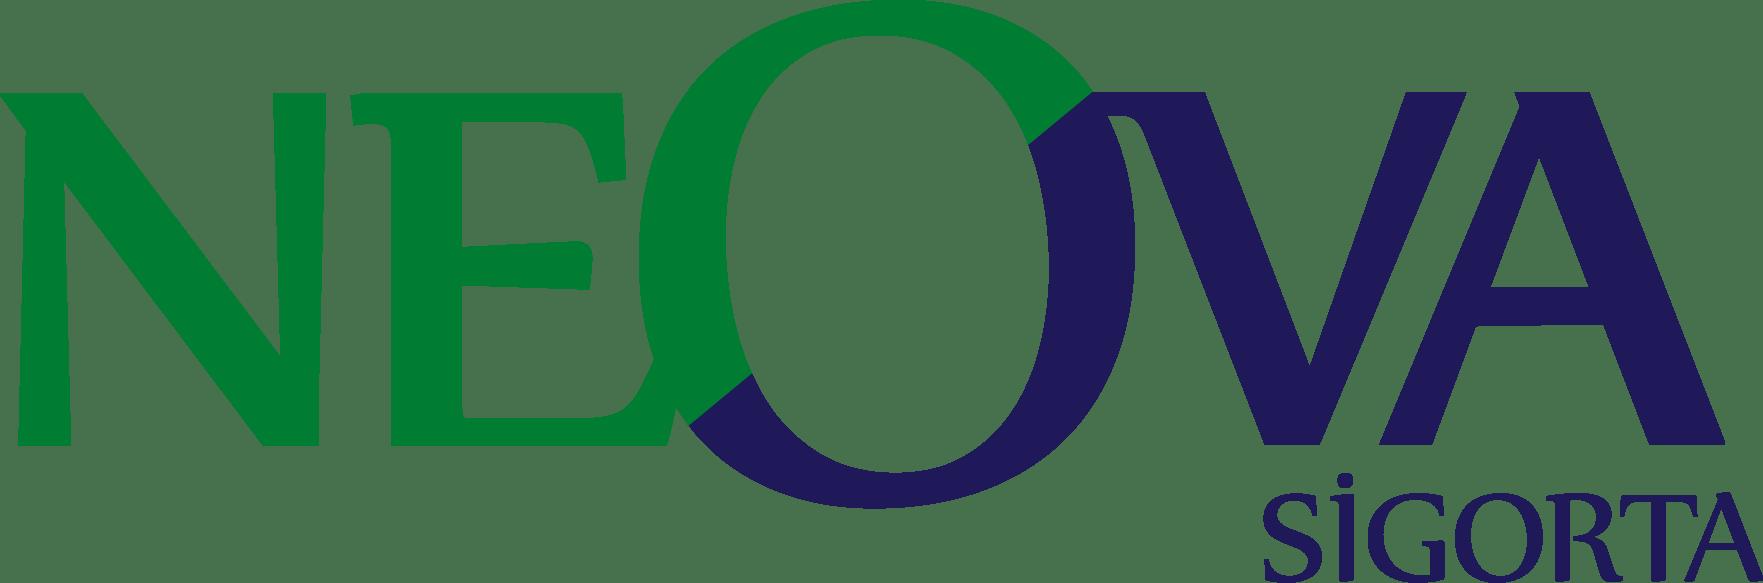 Neova Sigorta Logo png